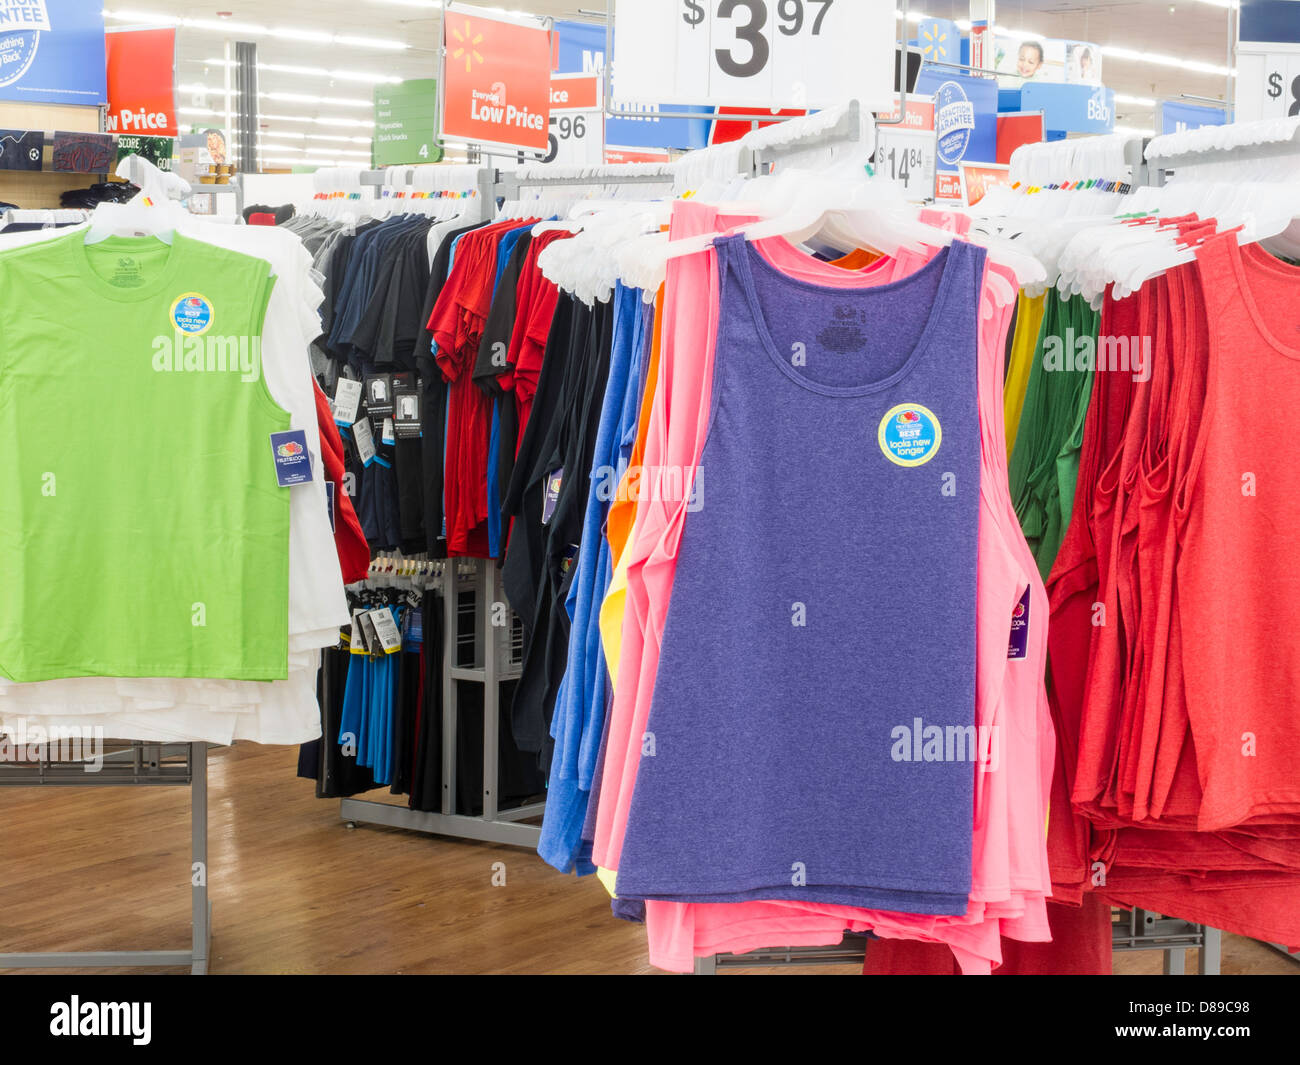 Walmart Store Price Usa Stockfotos & Walmart Store Price Usa Bilder ...